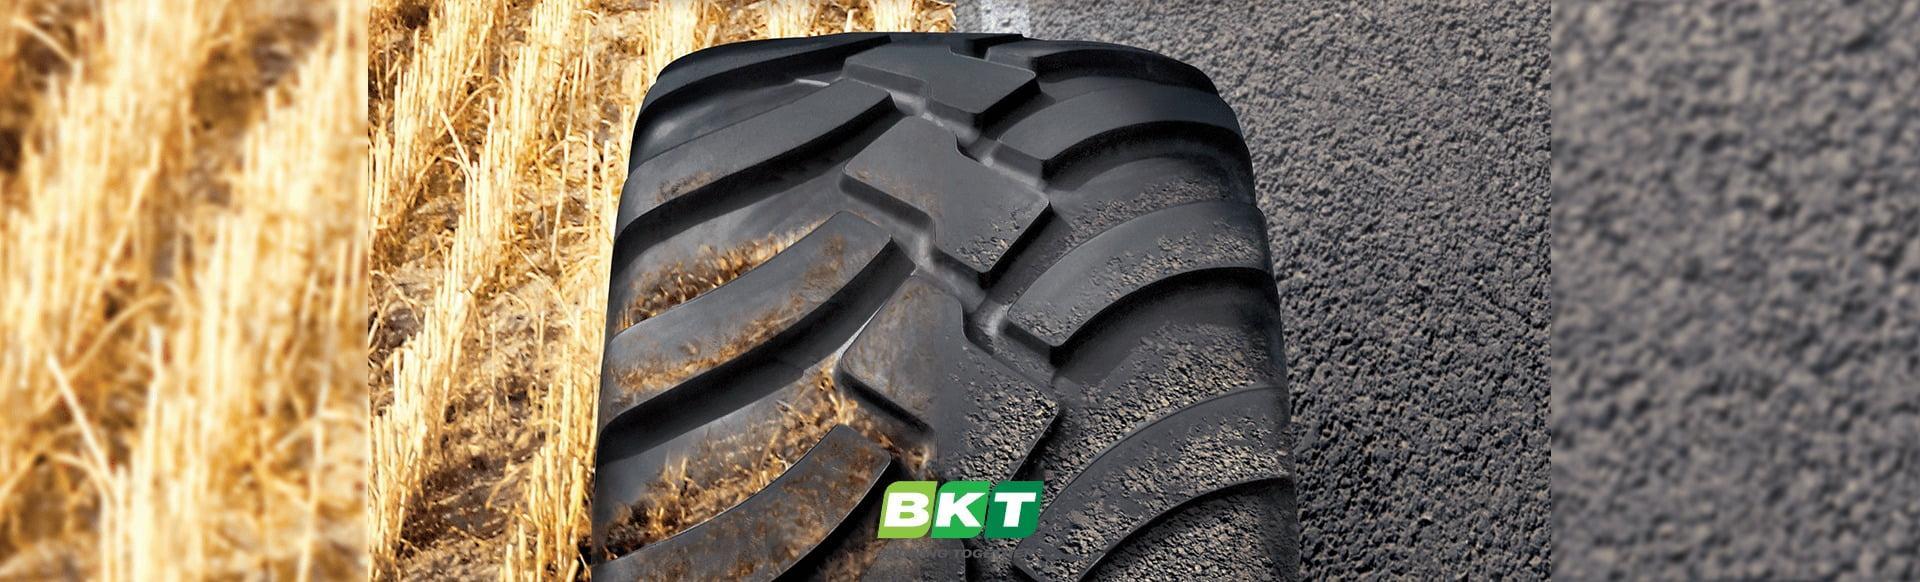 renova g pnevmatike 004